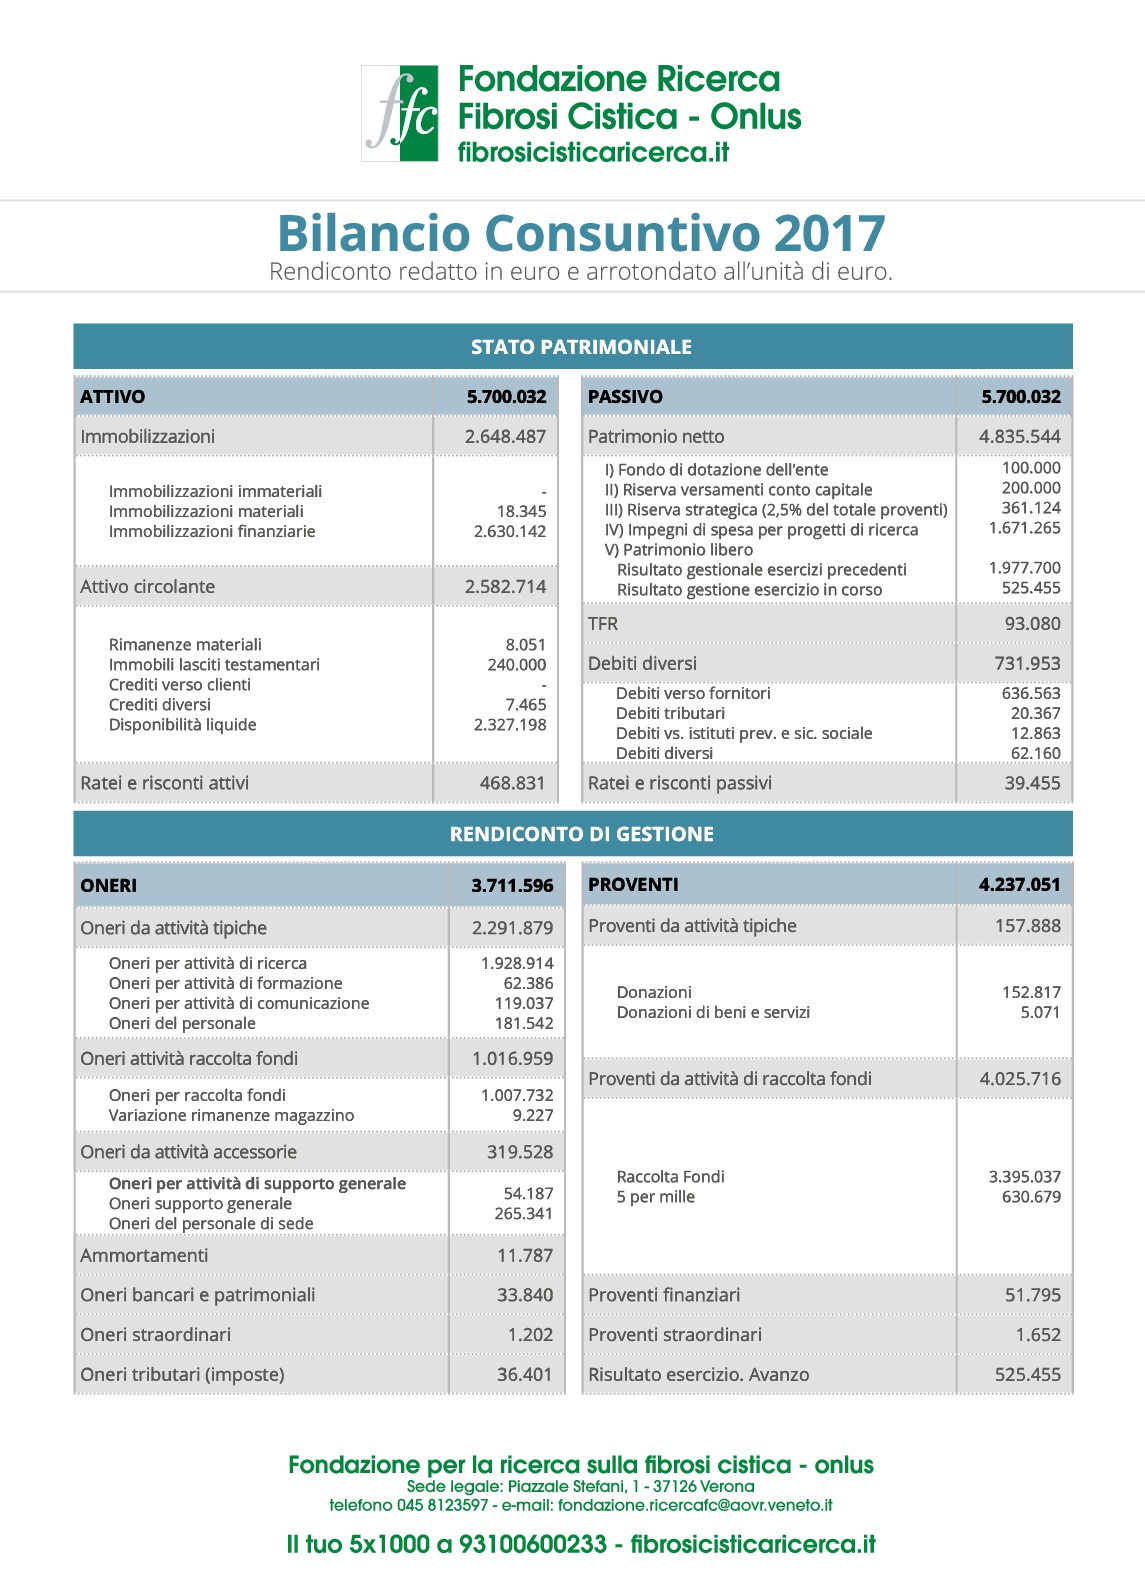 Bilancio FFC 2017